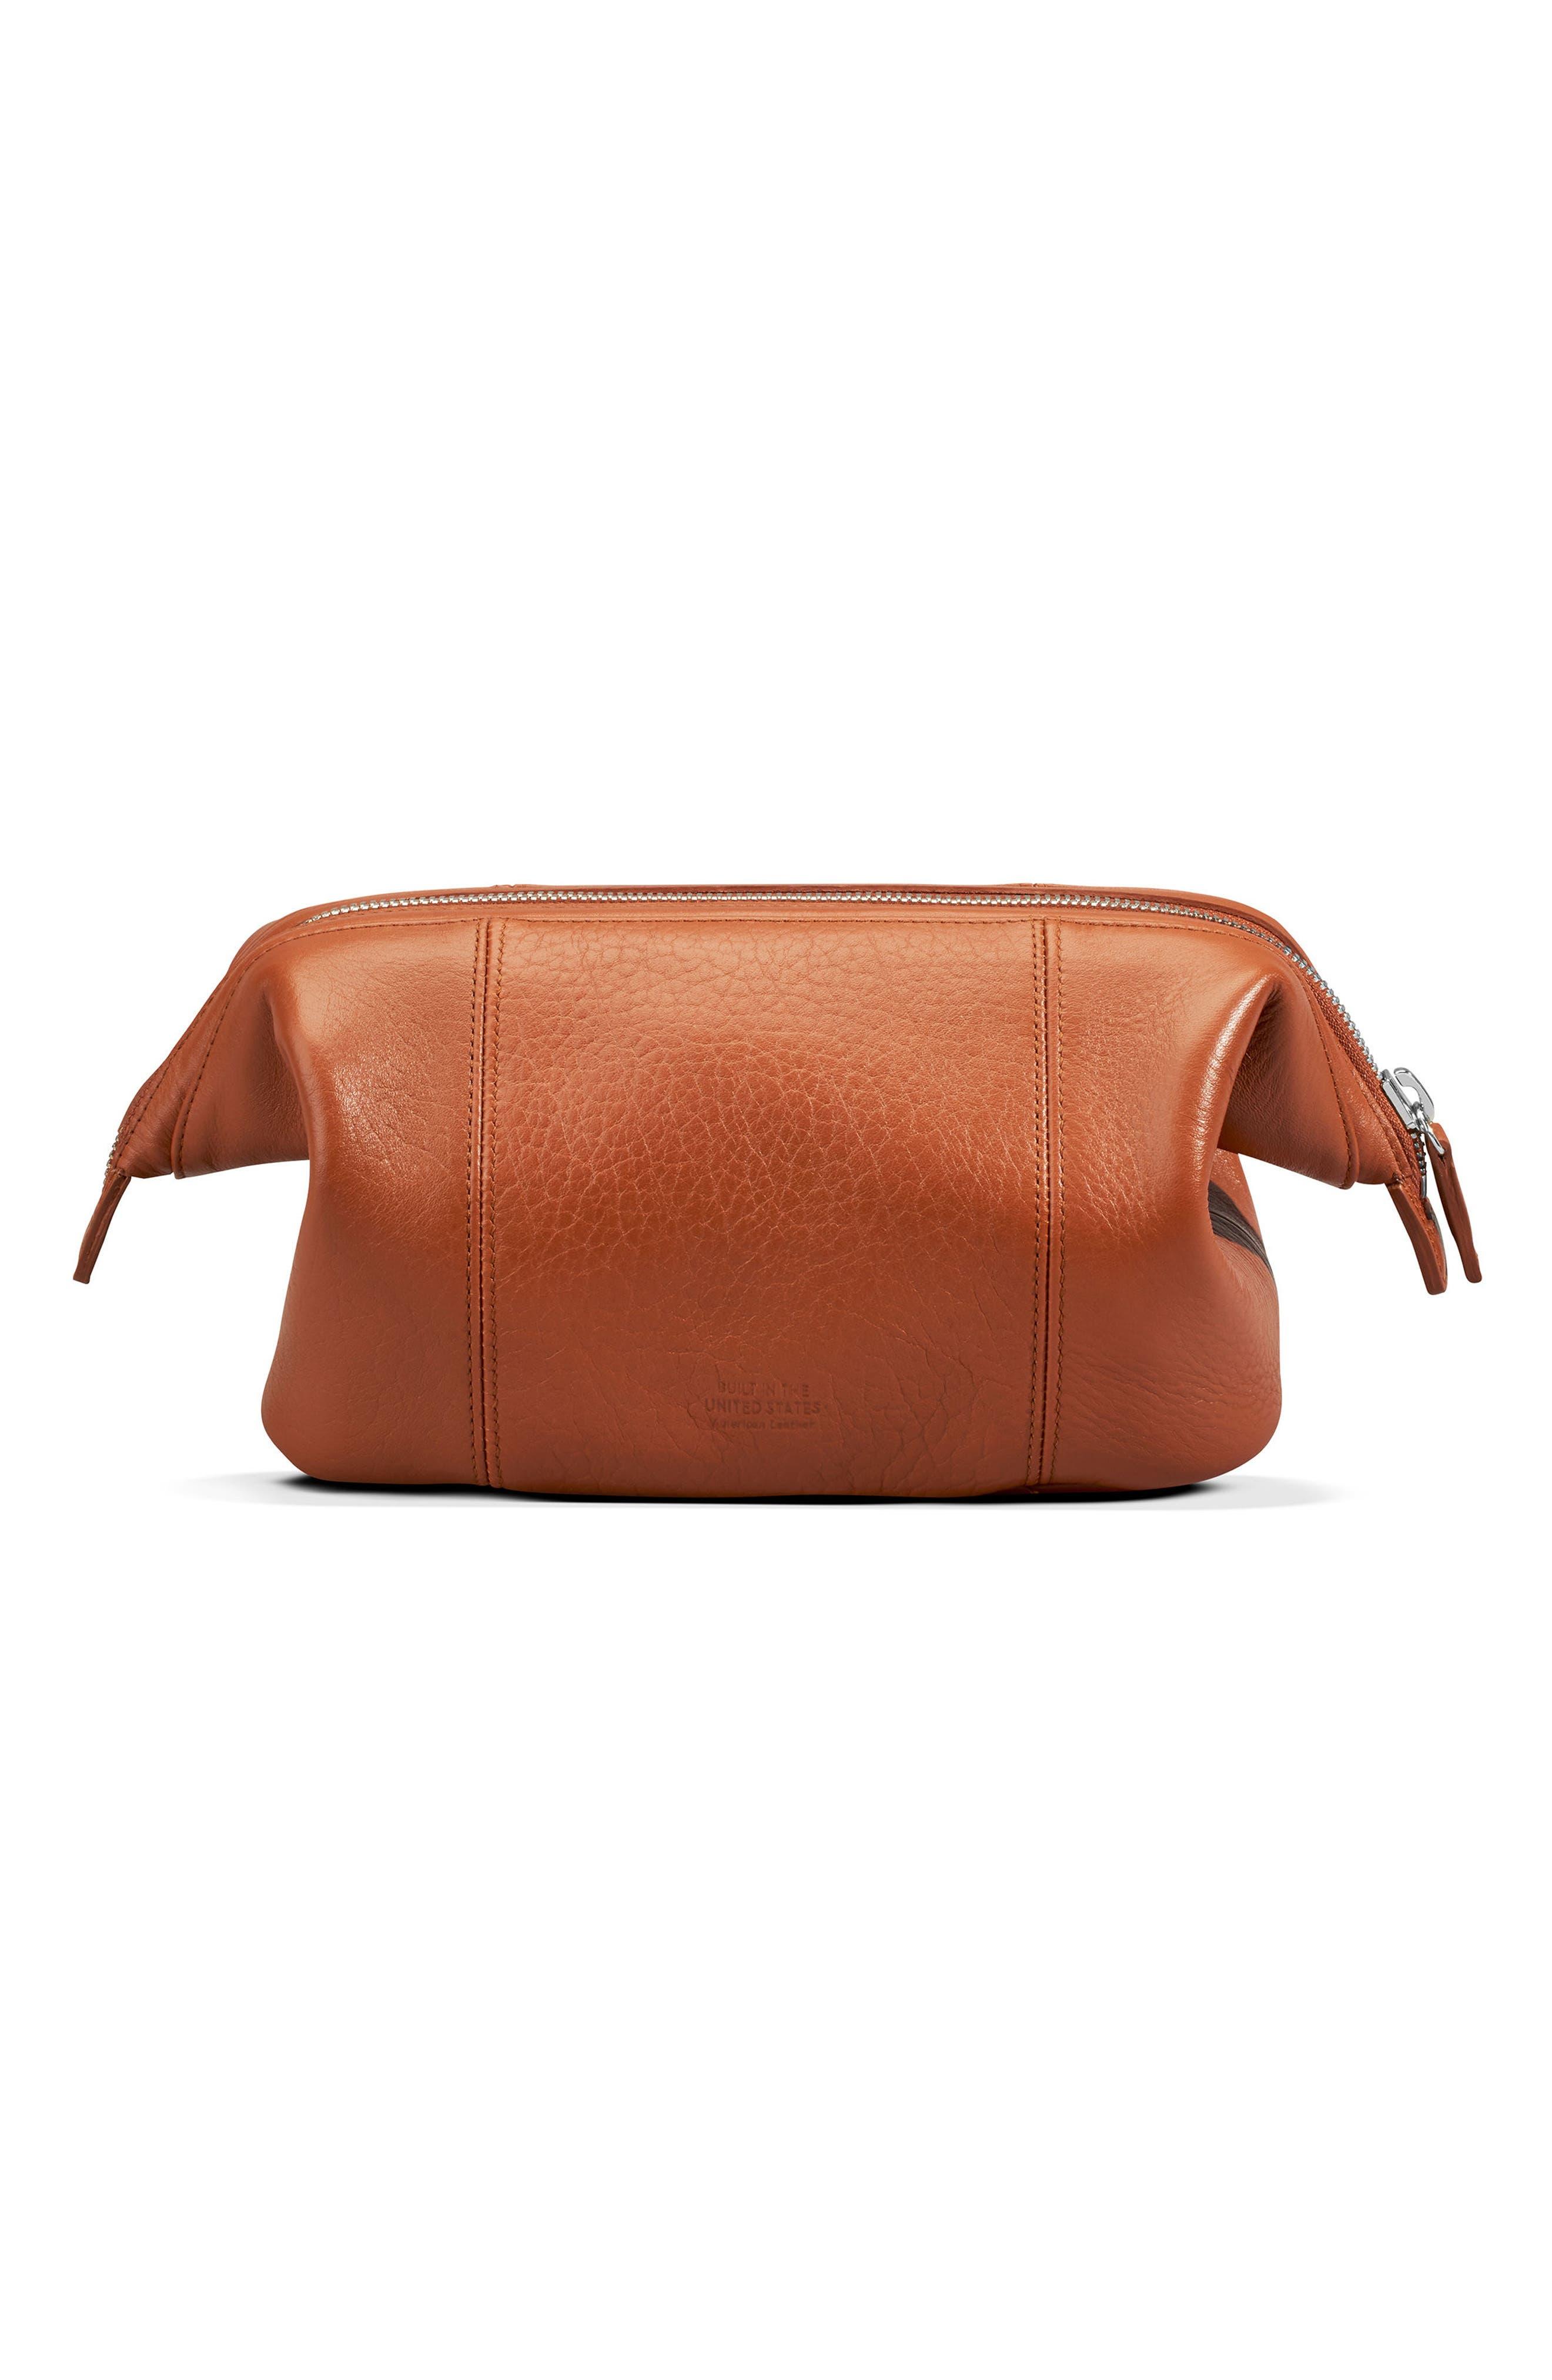 Leather Travel Kit,                             Alternate thumbnail 5, color,